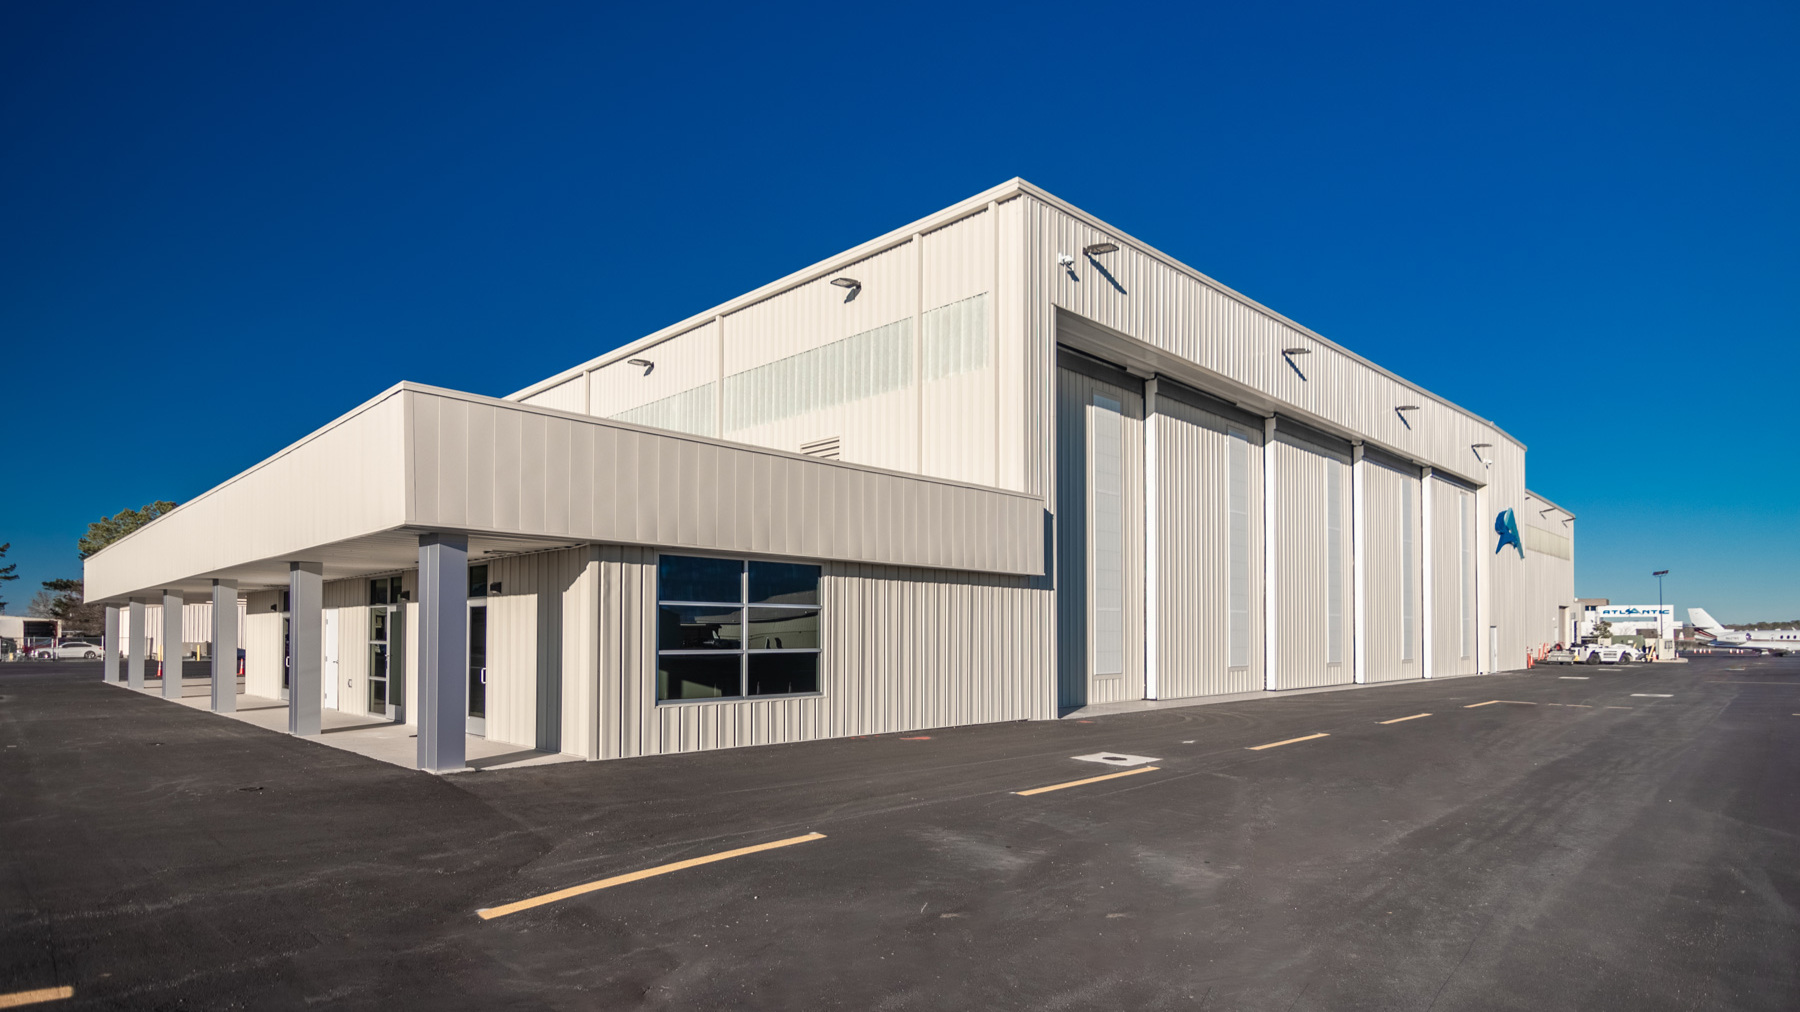 PDK_Hangar-1-Exterior-1.jpg